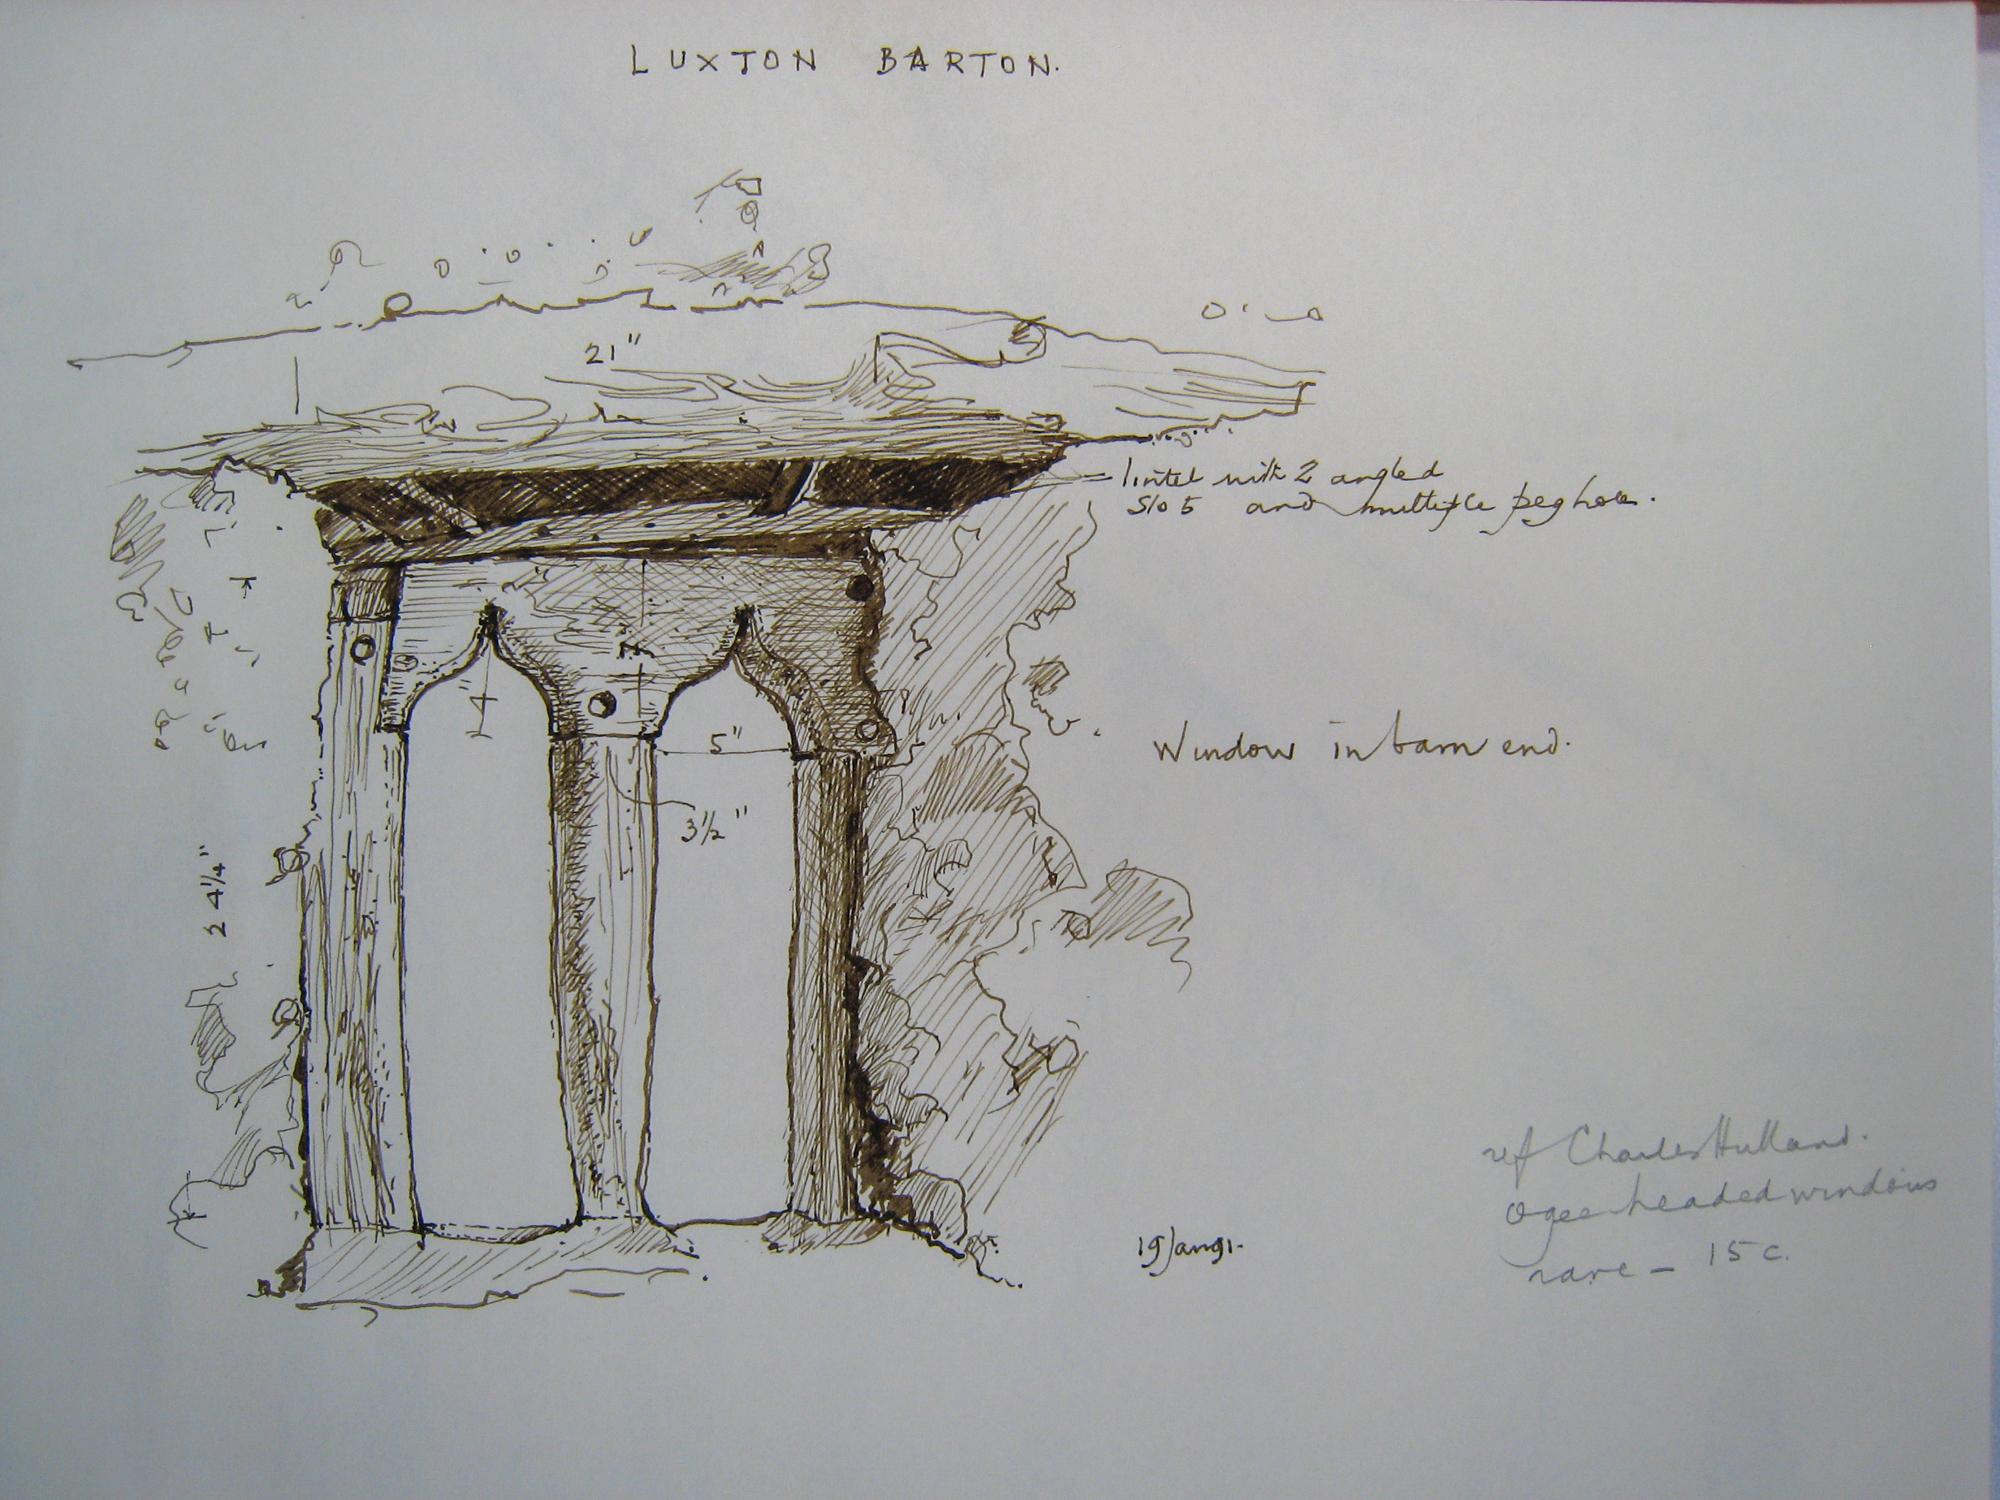 OB 30 Luxton Barton Bondleigh